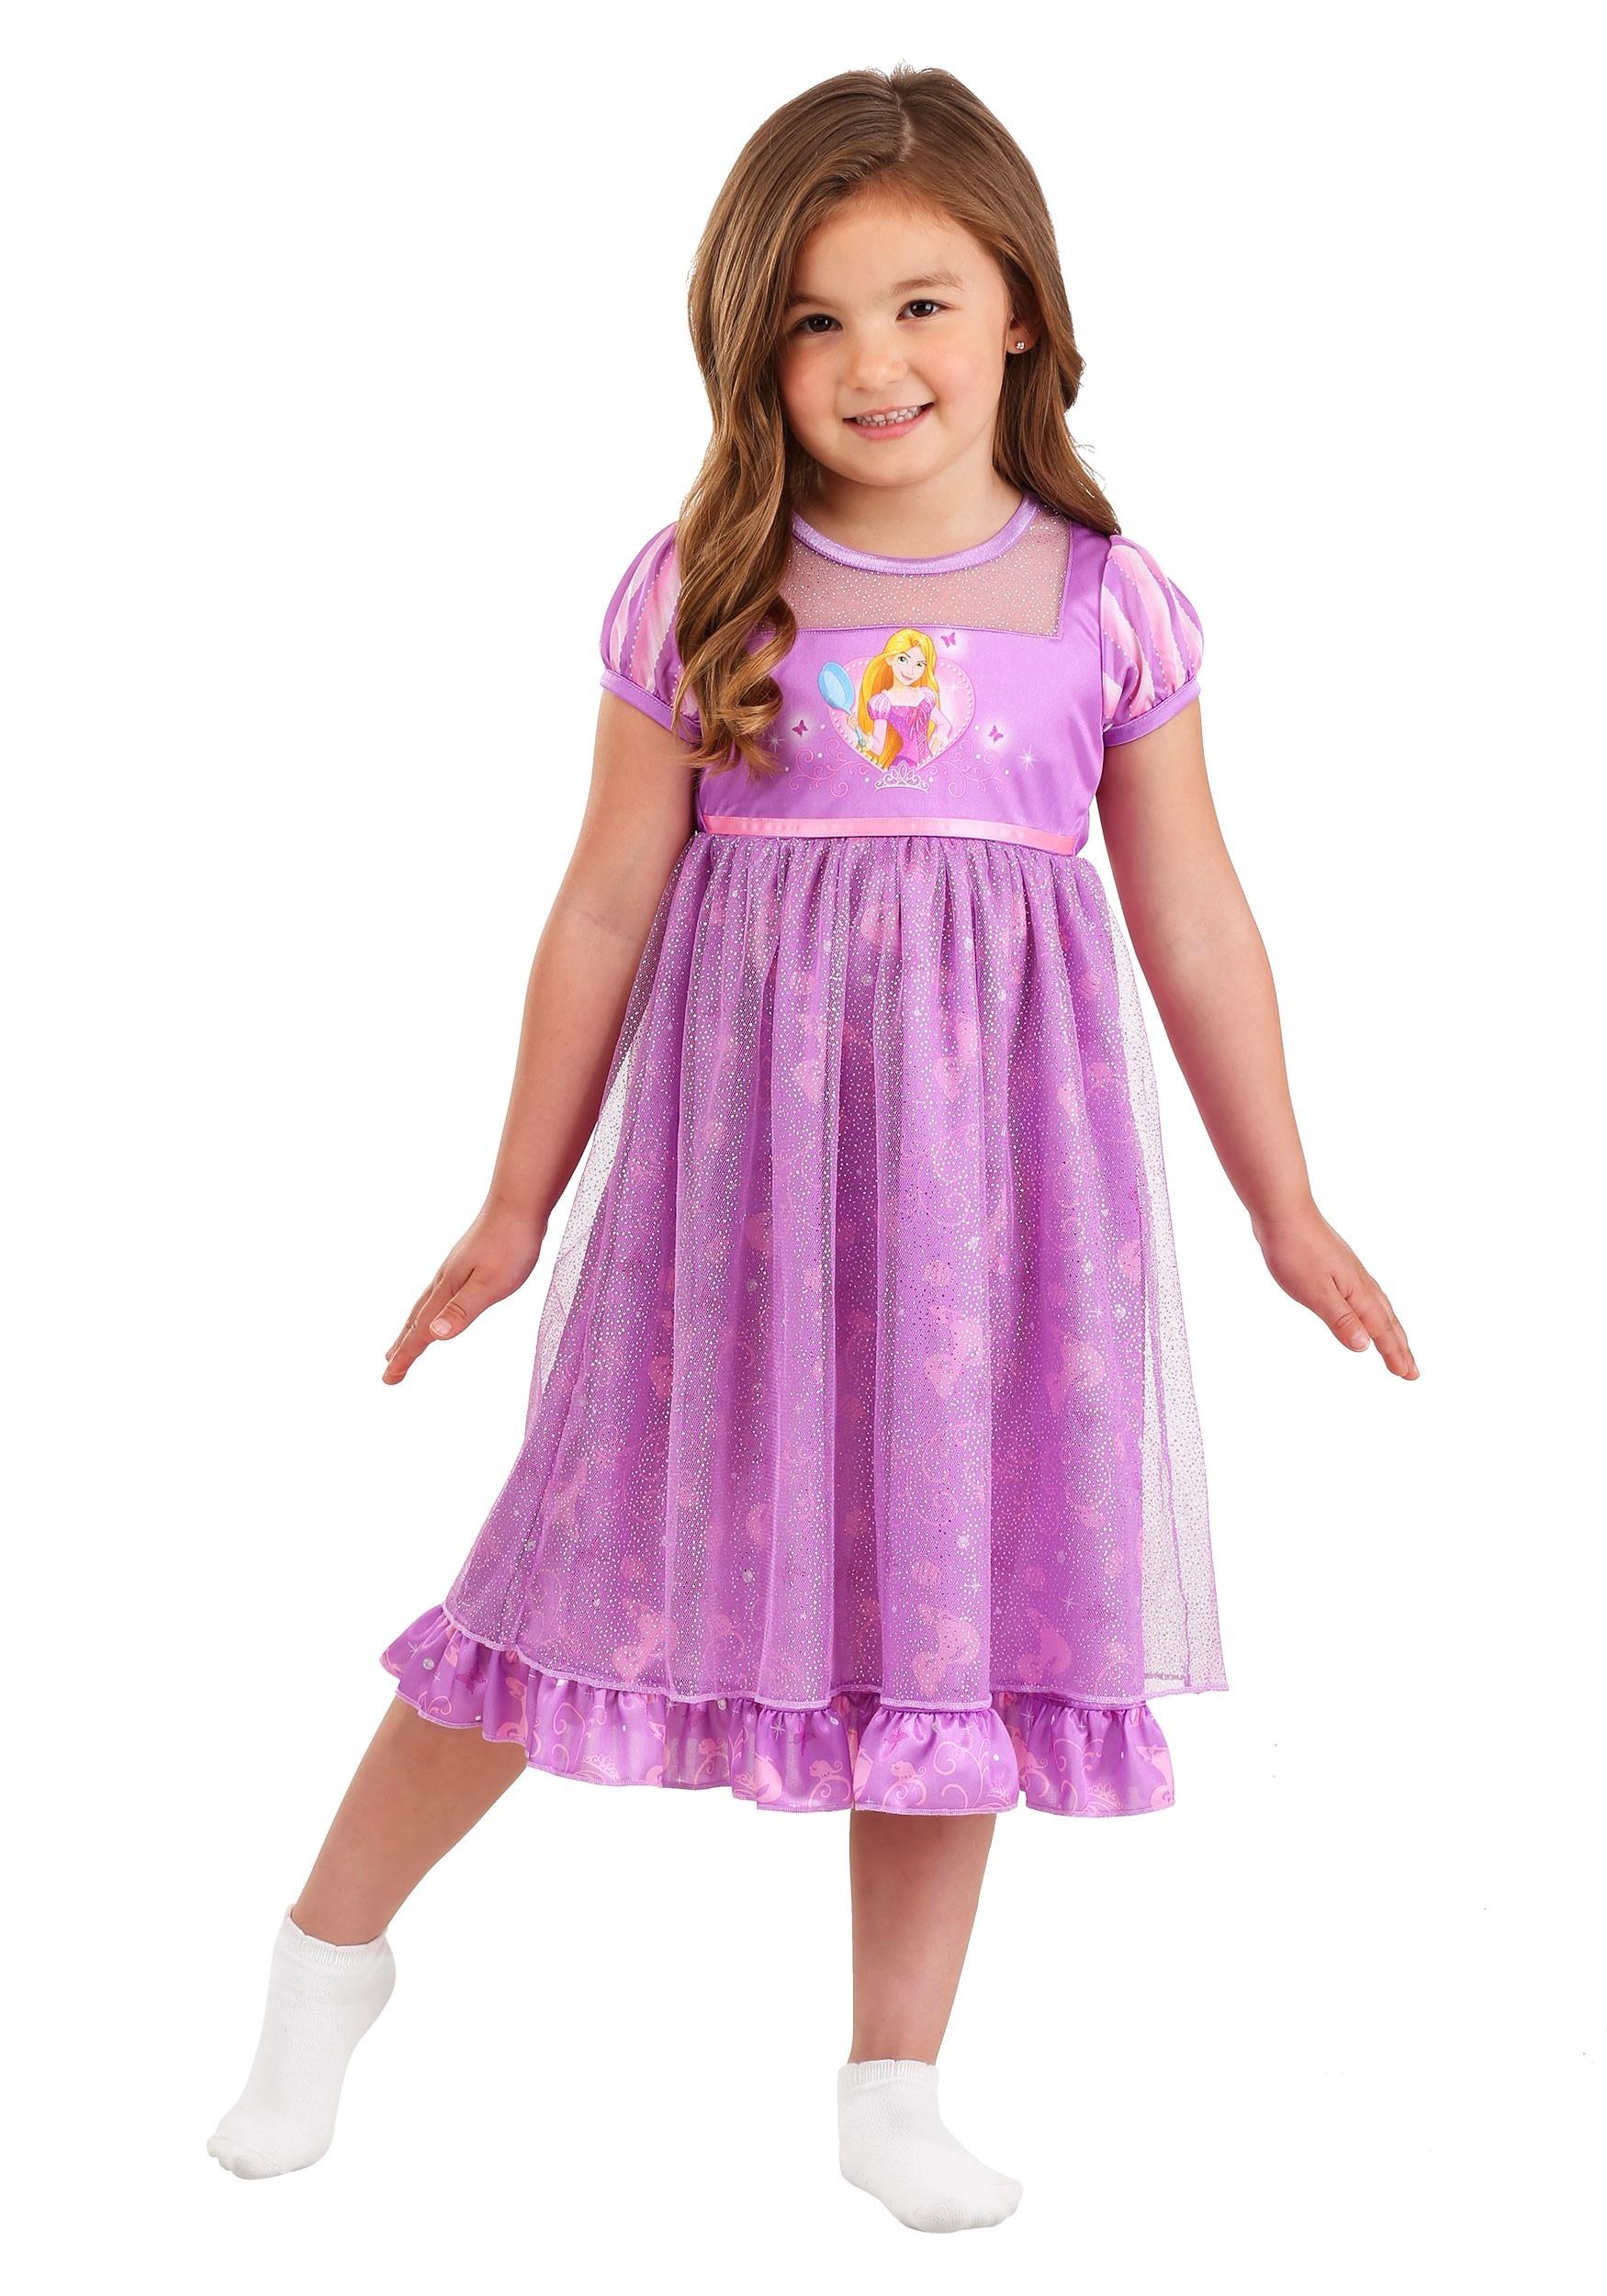 Disney_Rapunzel_Fantasy_Sleep_Gown_for_Girls